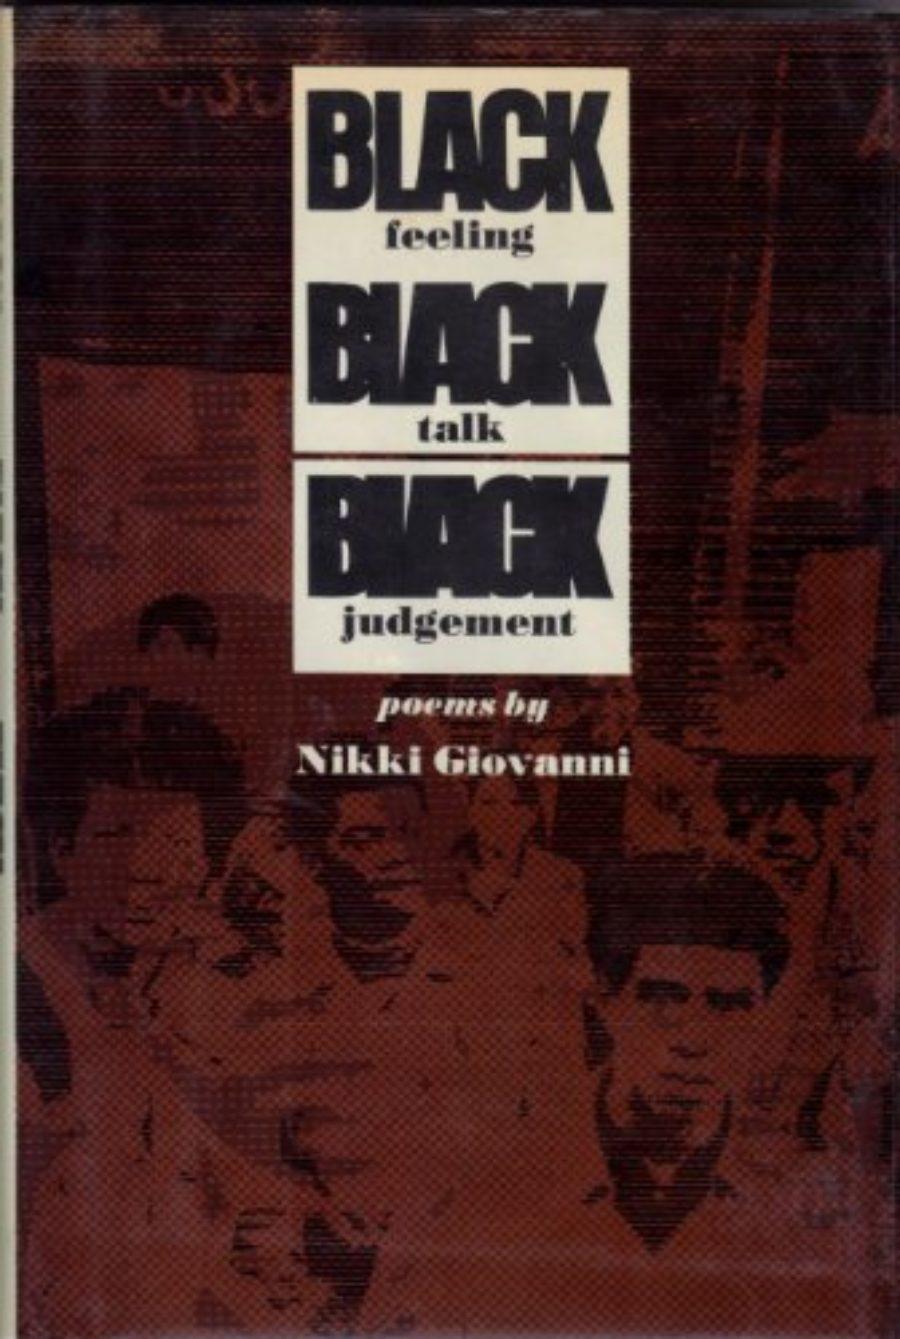 Cover of Black Feeling Black Talk Black Judgement